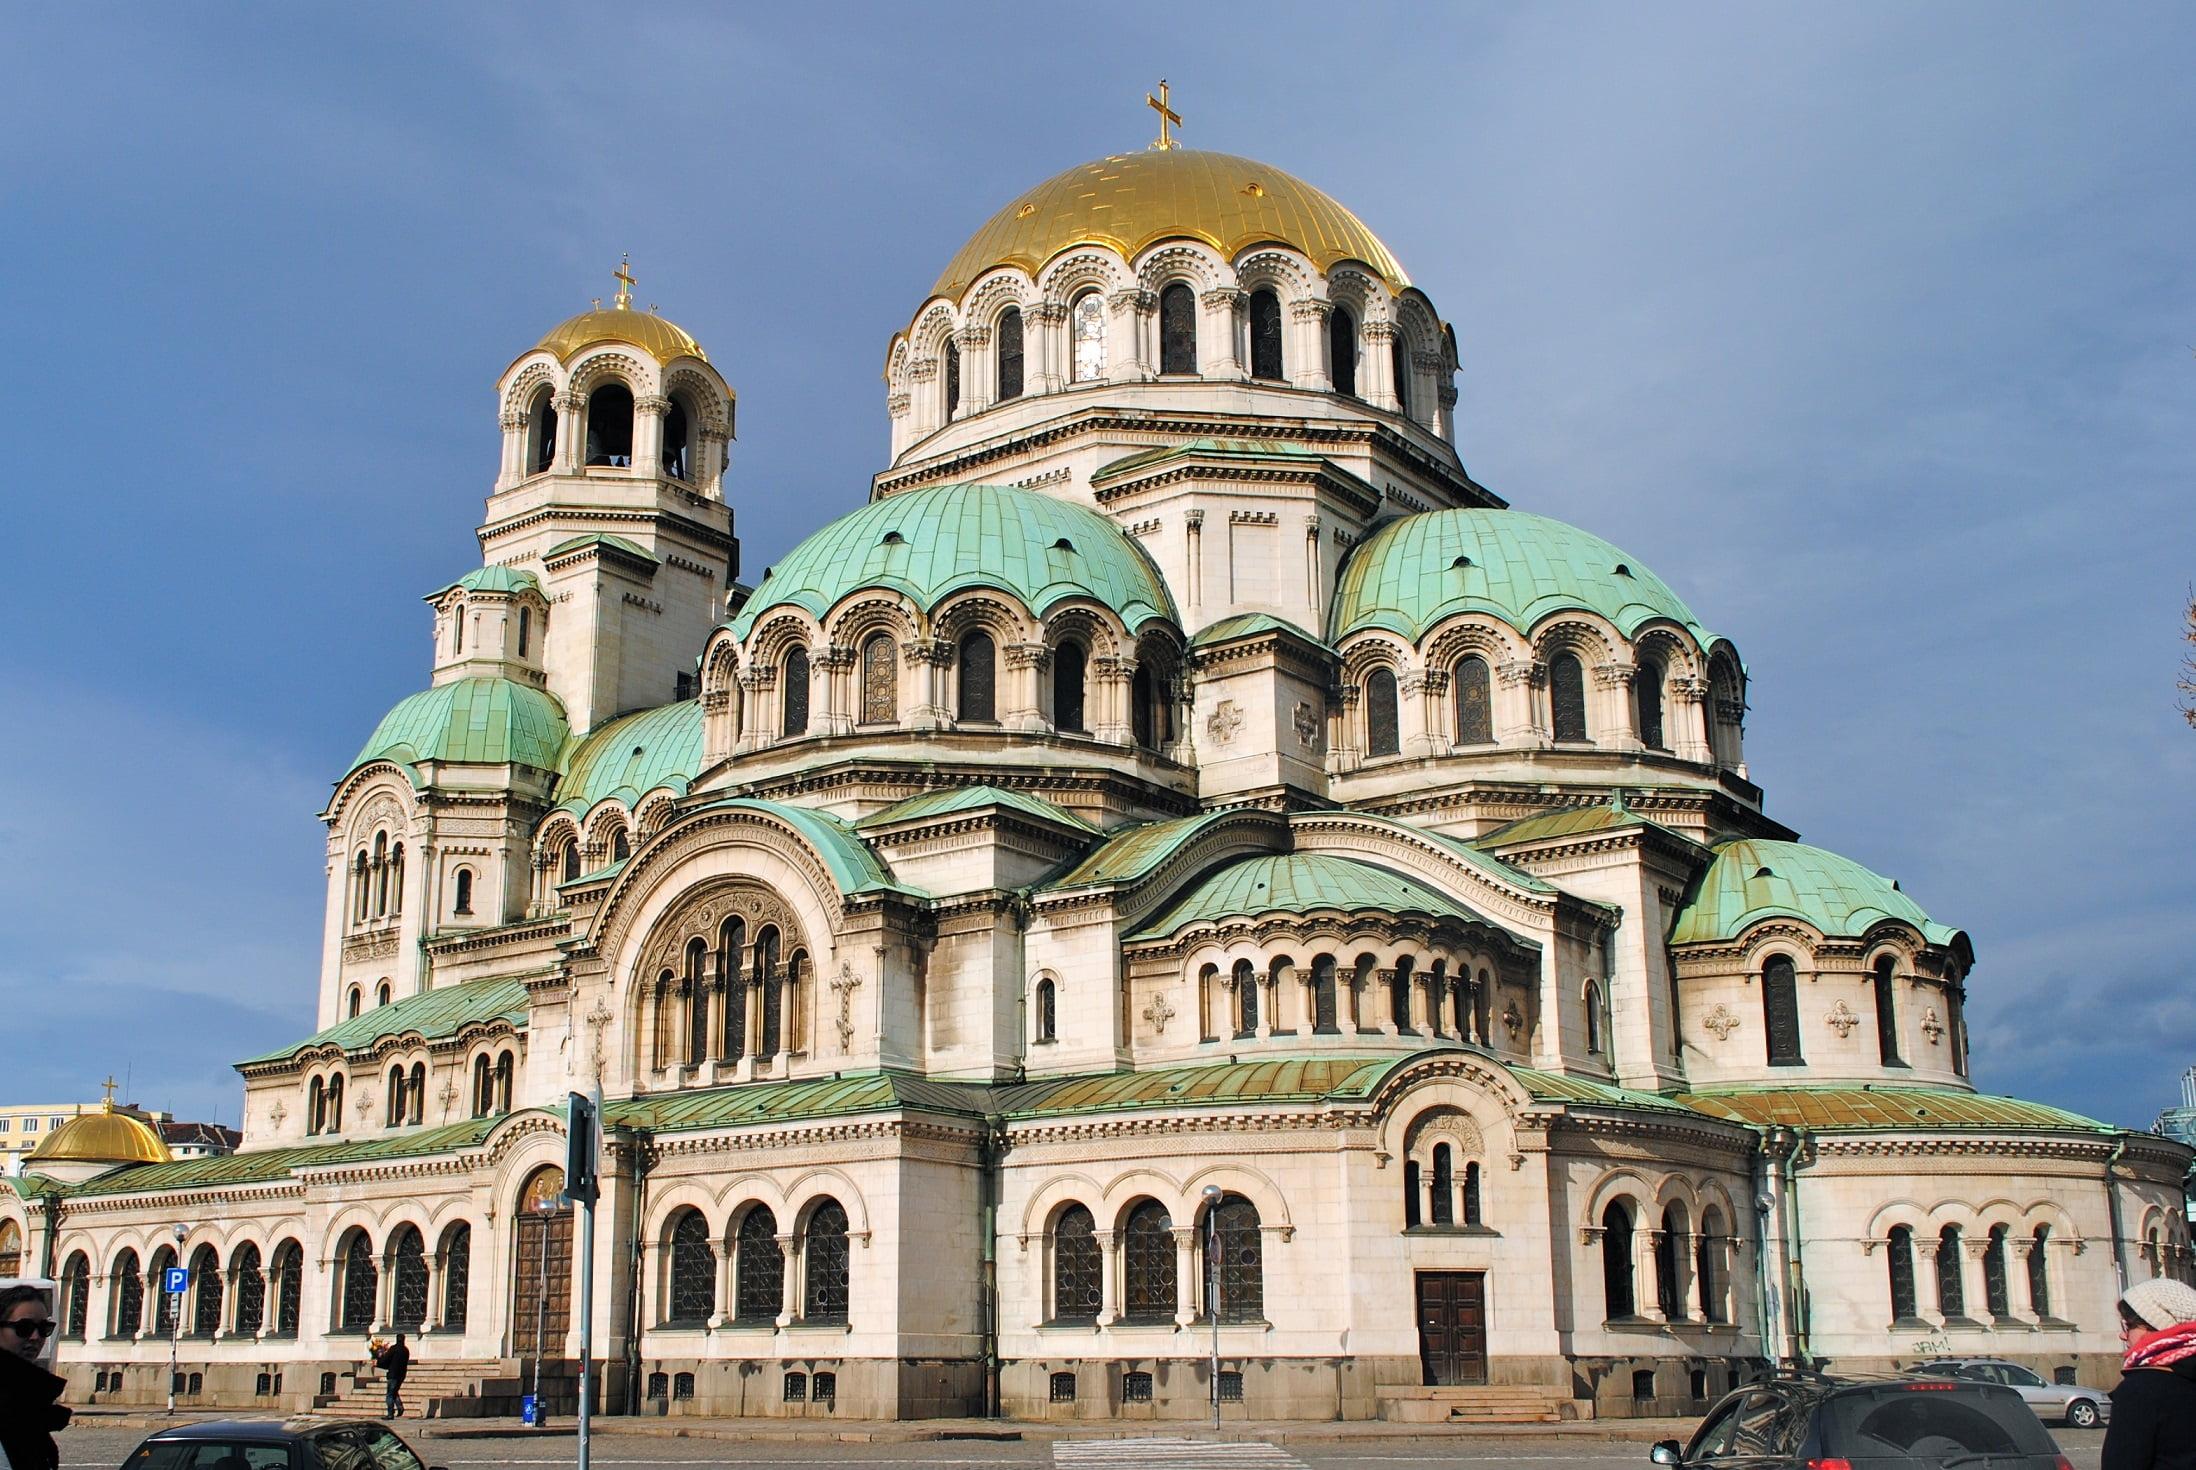 Catedrala ortodoxă Alexander Nevsky sofia bulgaria orase